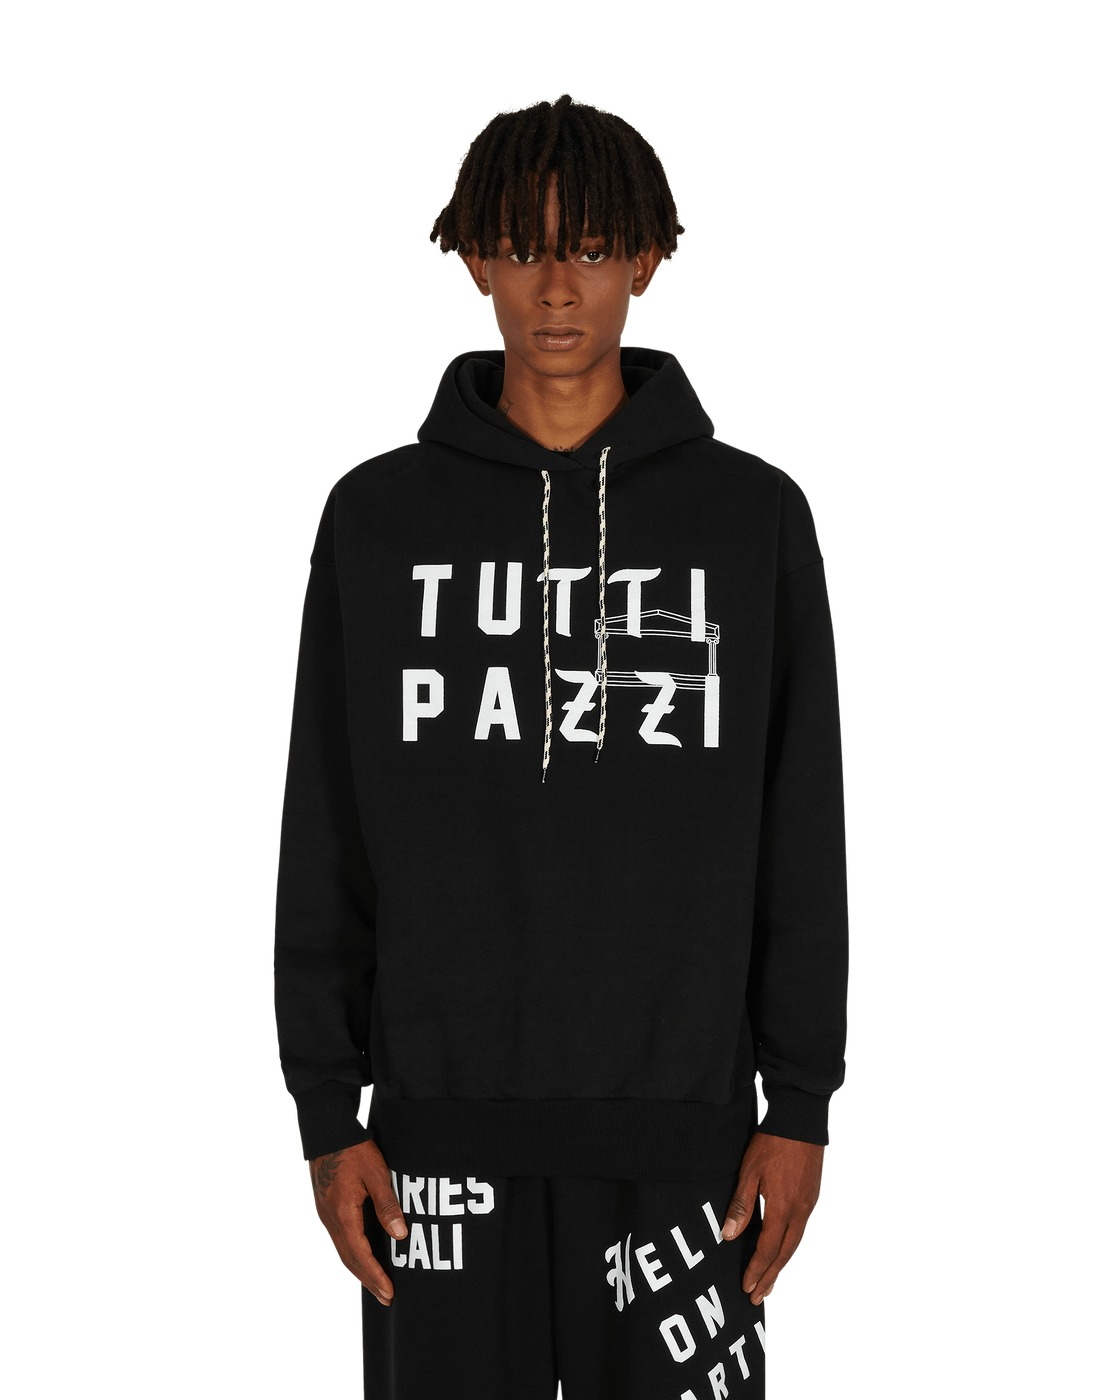 Photo: Aries Collab Nts Tutti Pazzi Hooded Sweatshirt Black